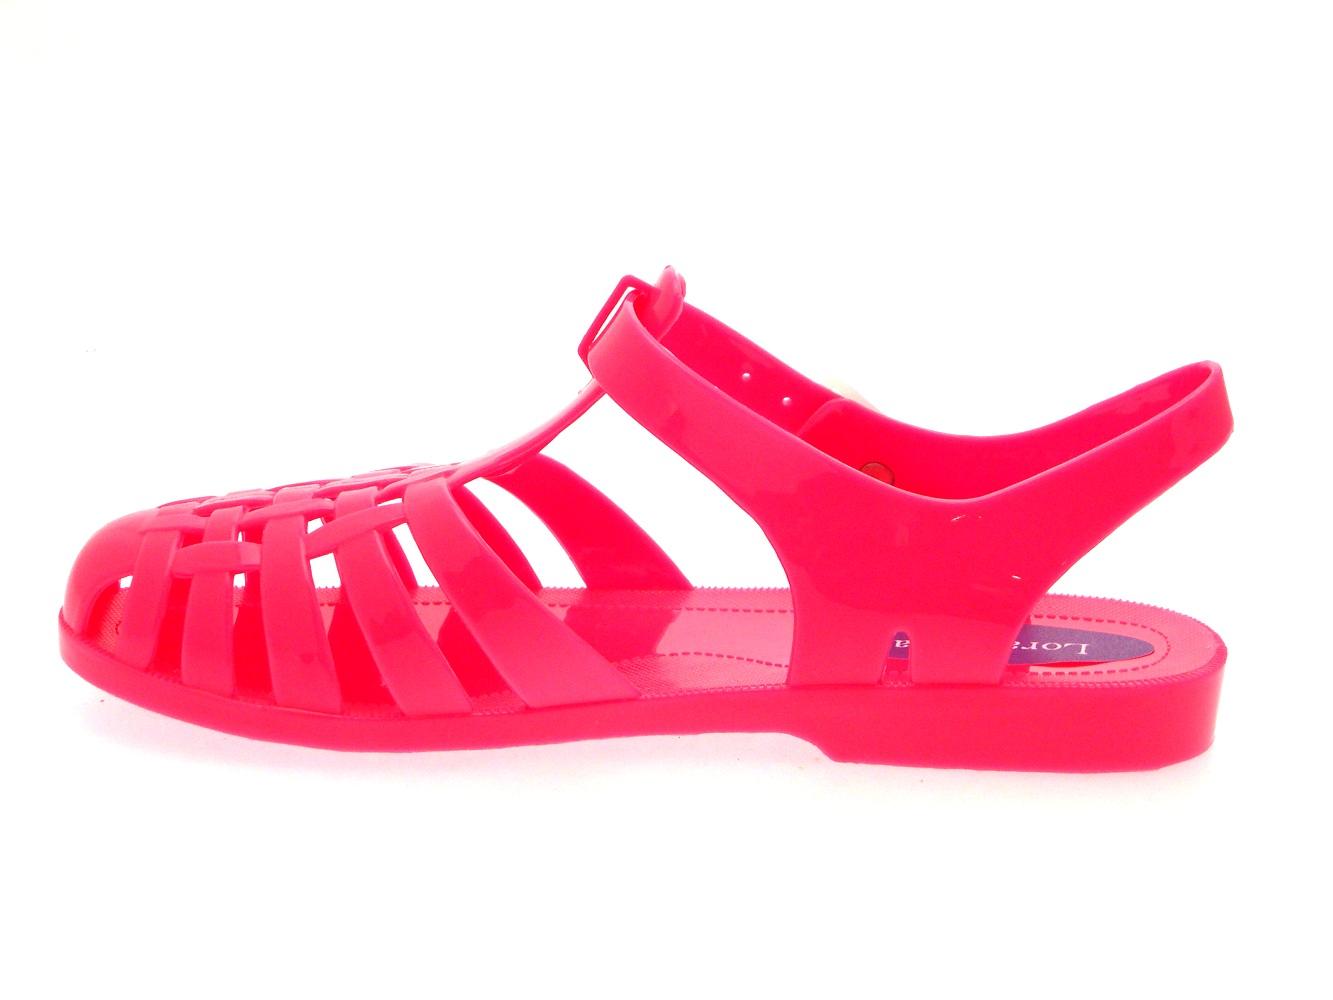 Girls Jelly Sandals Shoes Chunky Block Heel Diamante Kids